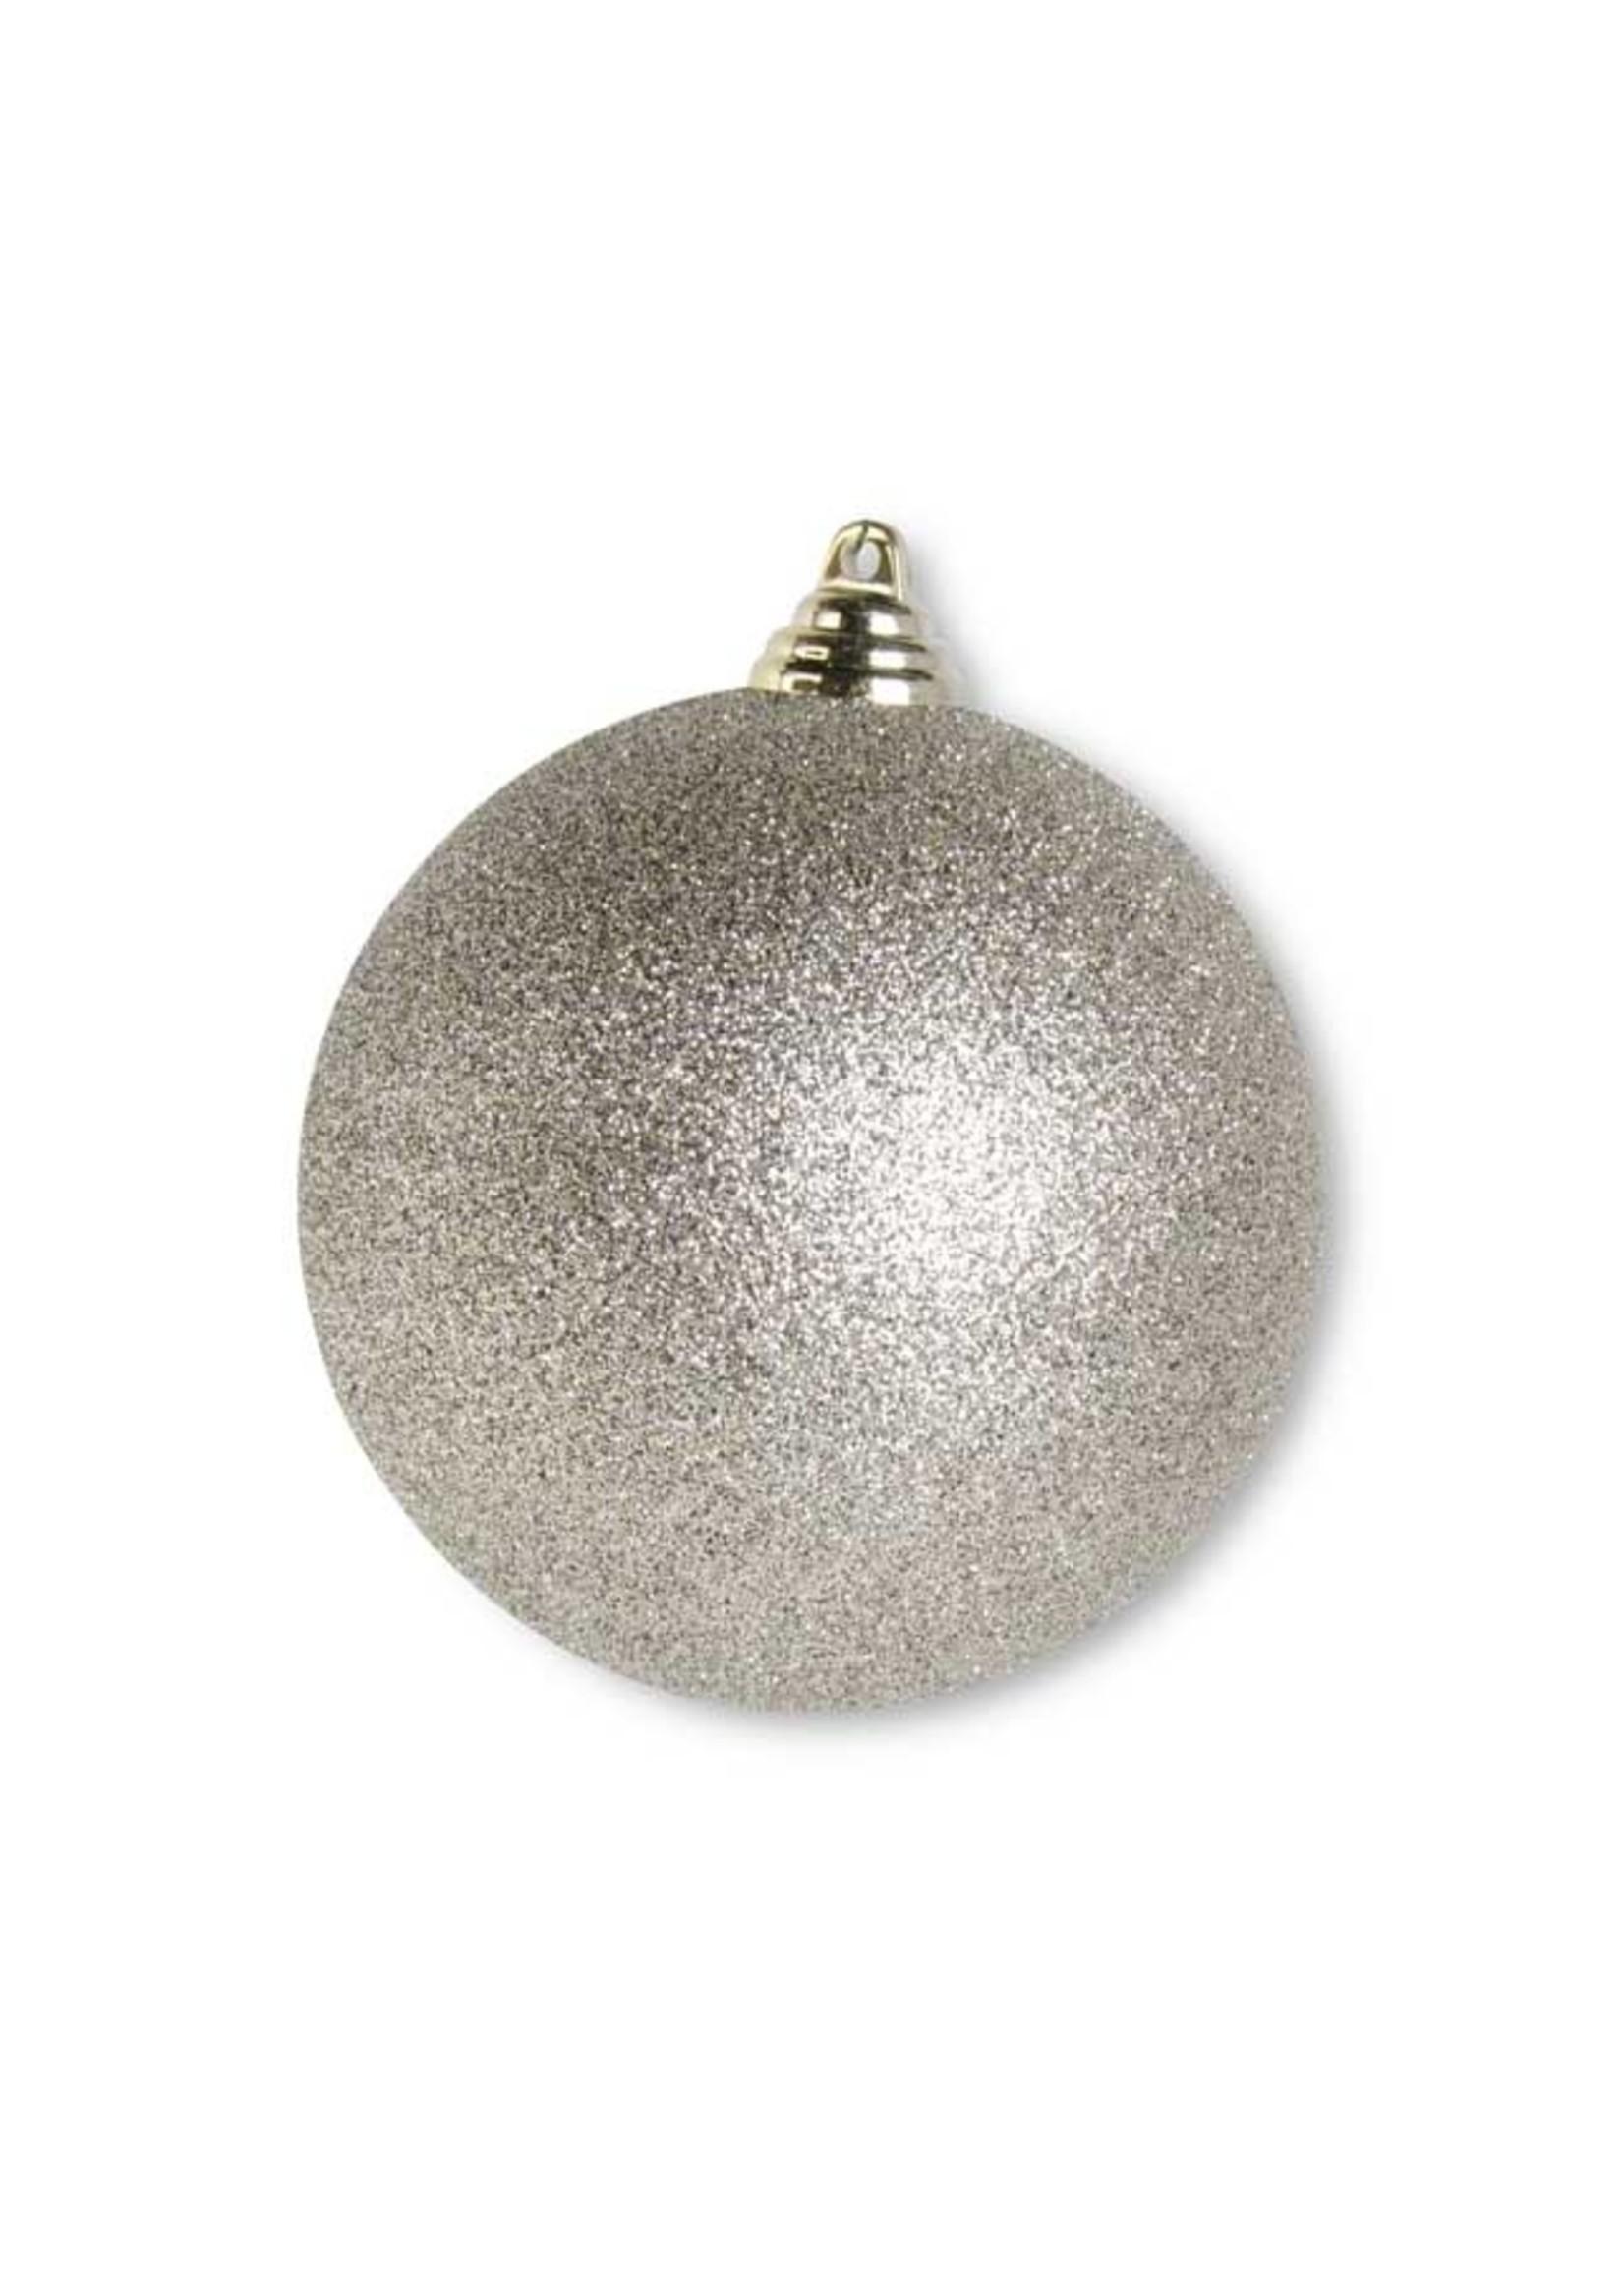 "K & K Interiors 4.5"" Champagne Glittered Shatterproof Round Ornament"